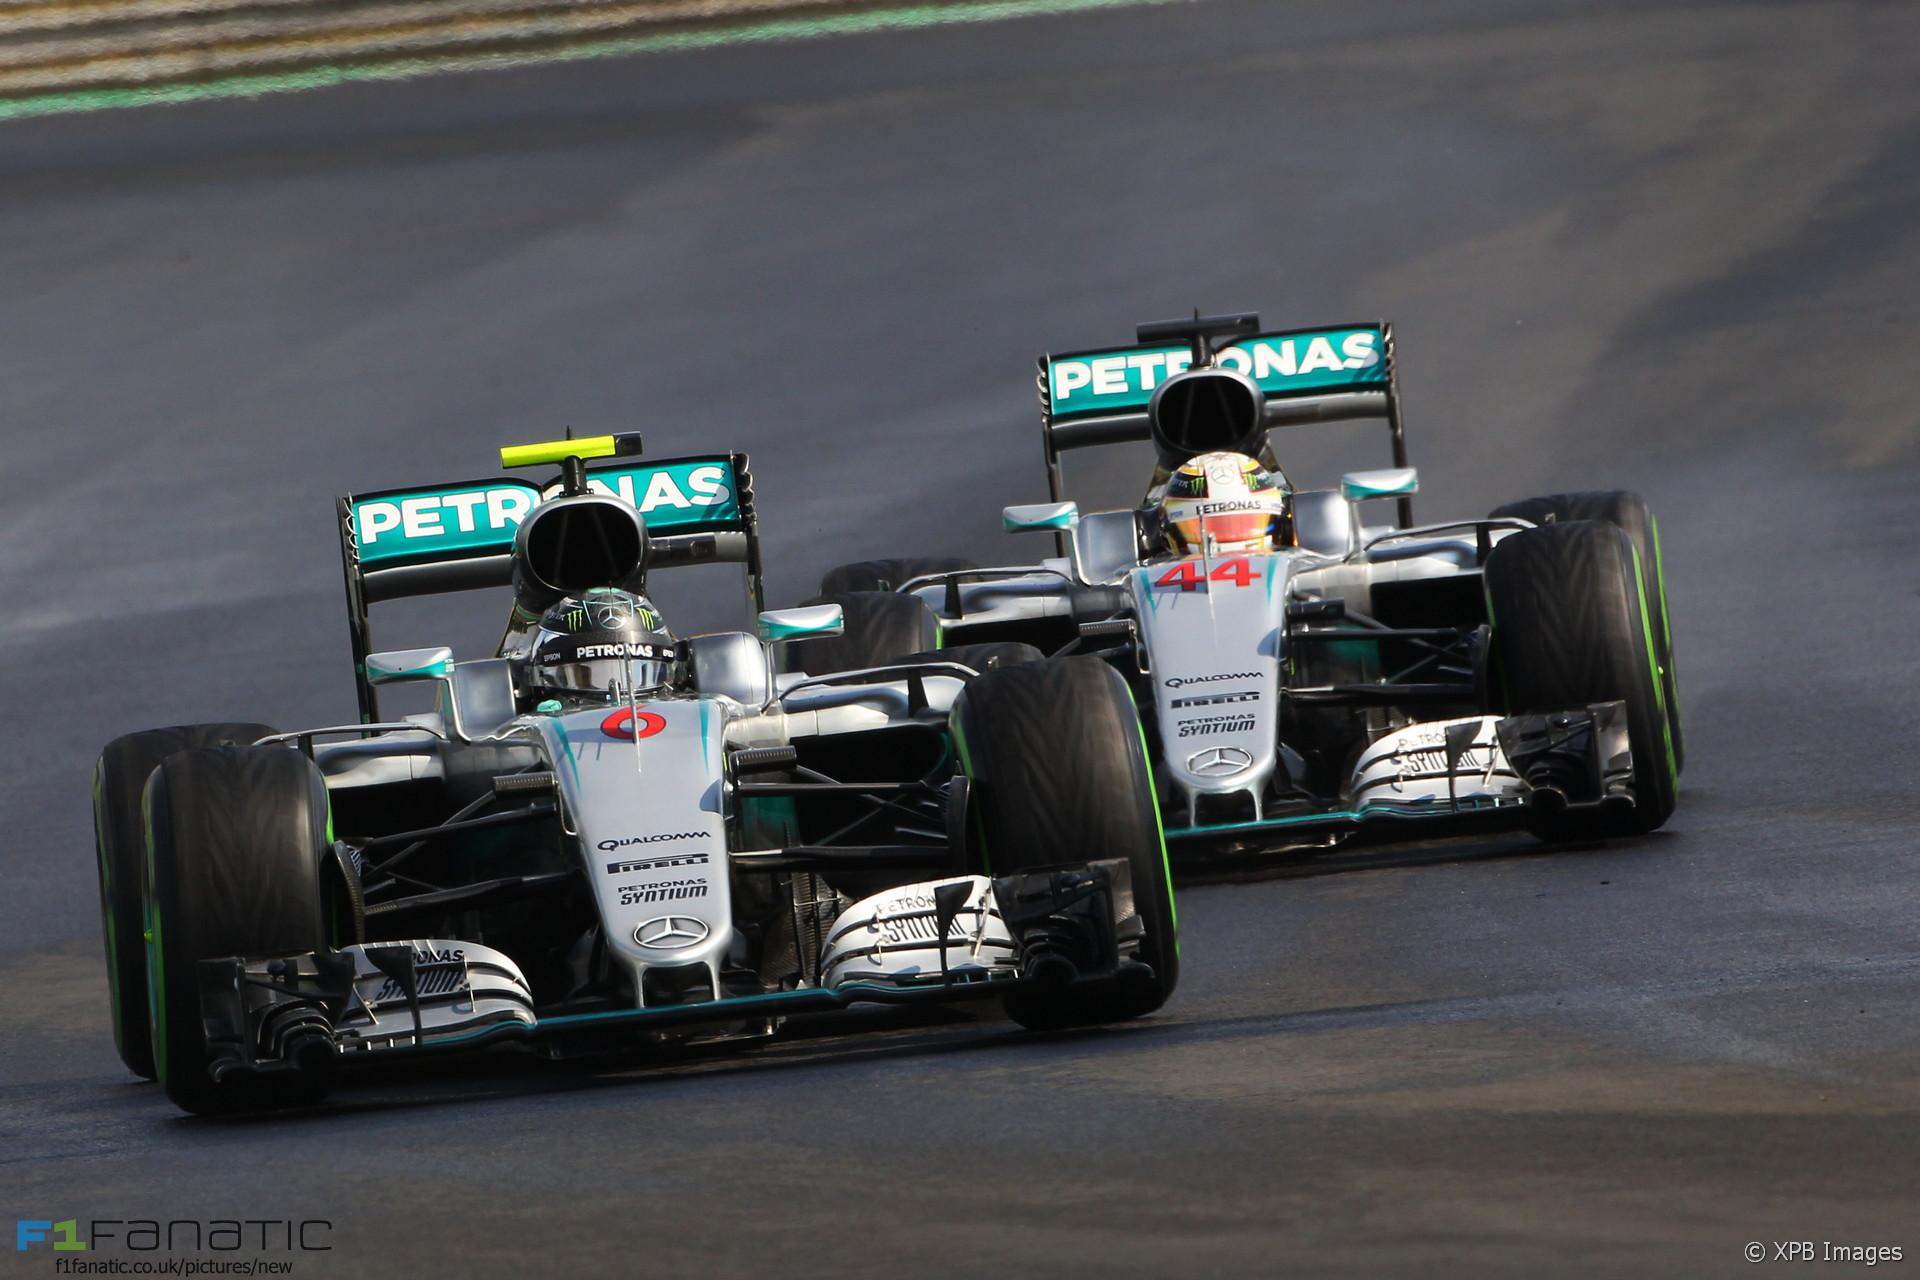 Nico Rosberg, Lewis Hamilton, Mercedes, Hungaroring, 2016